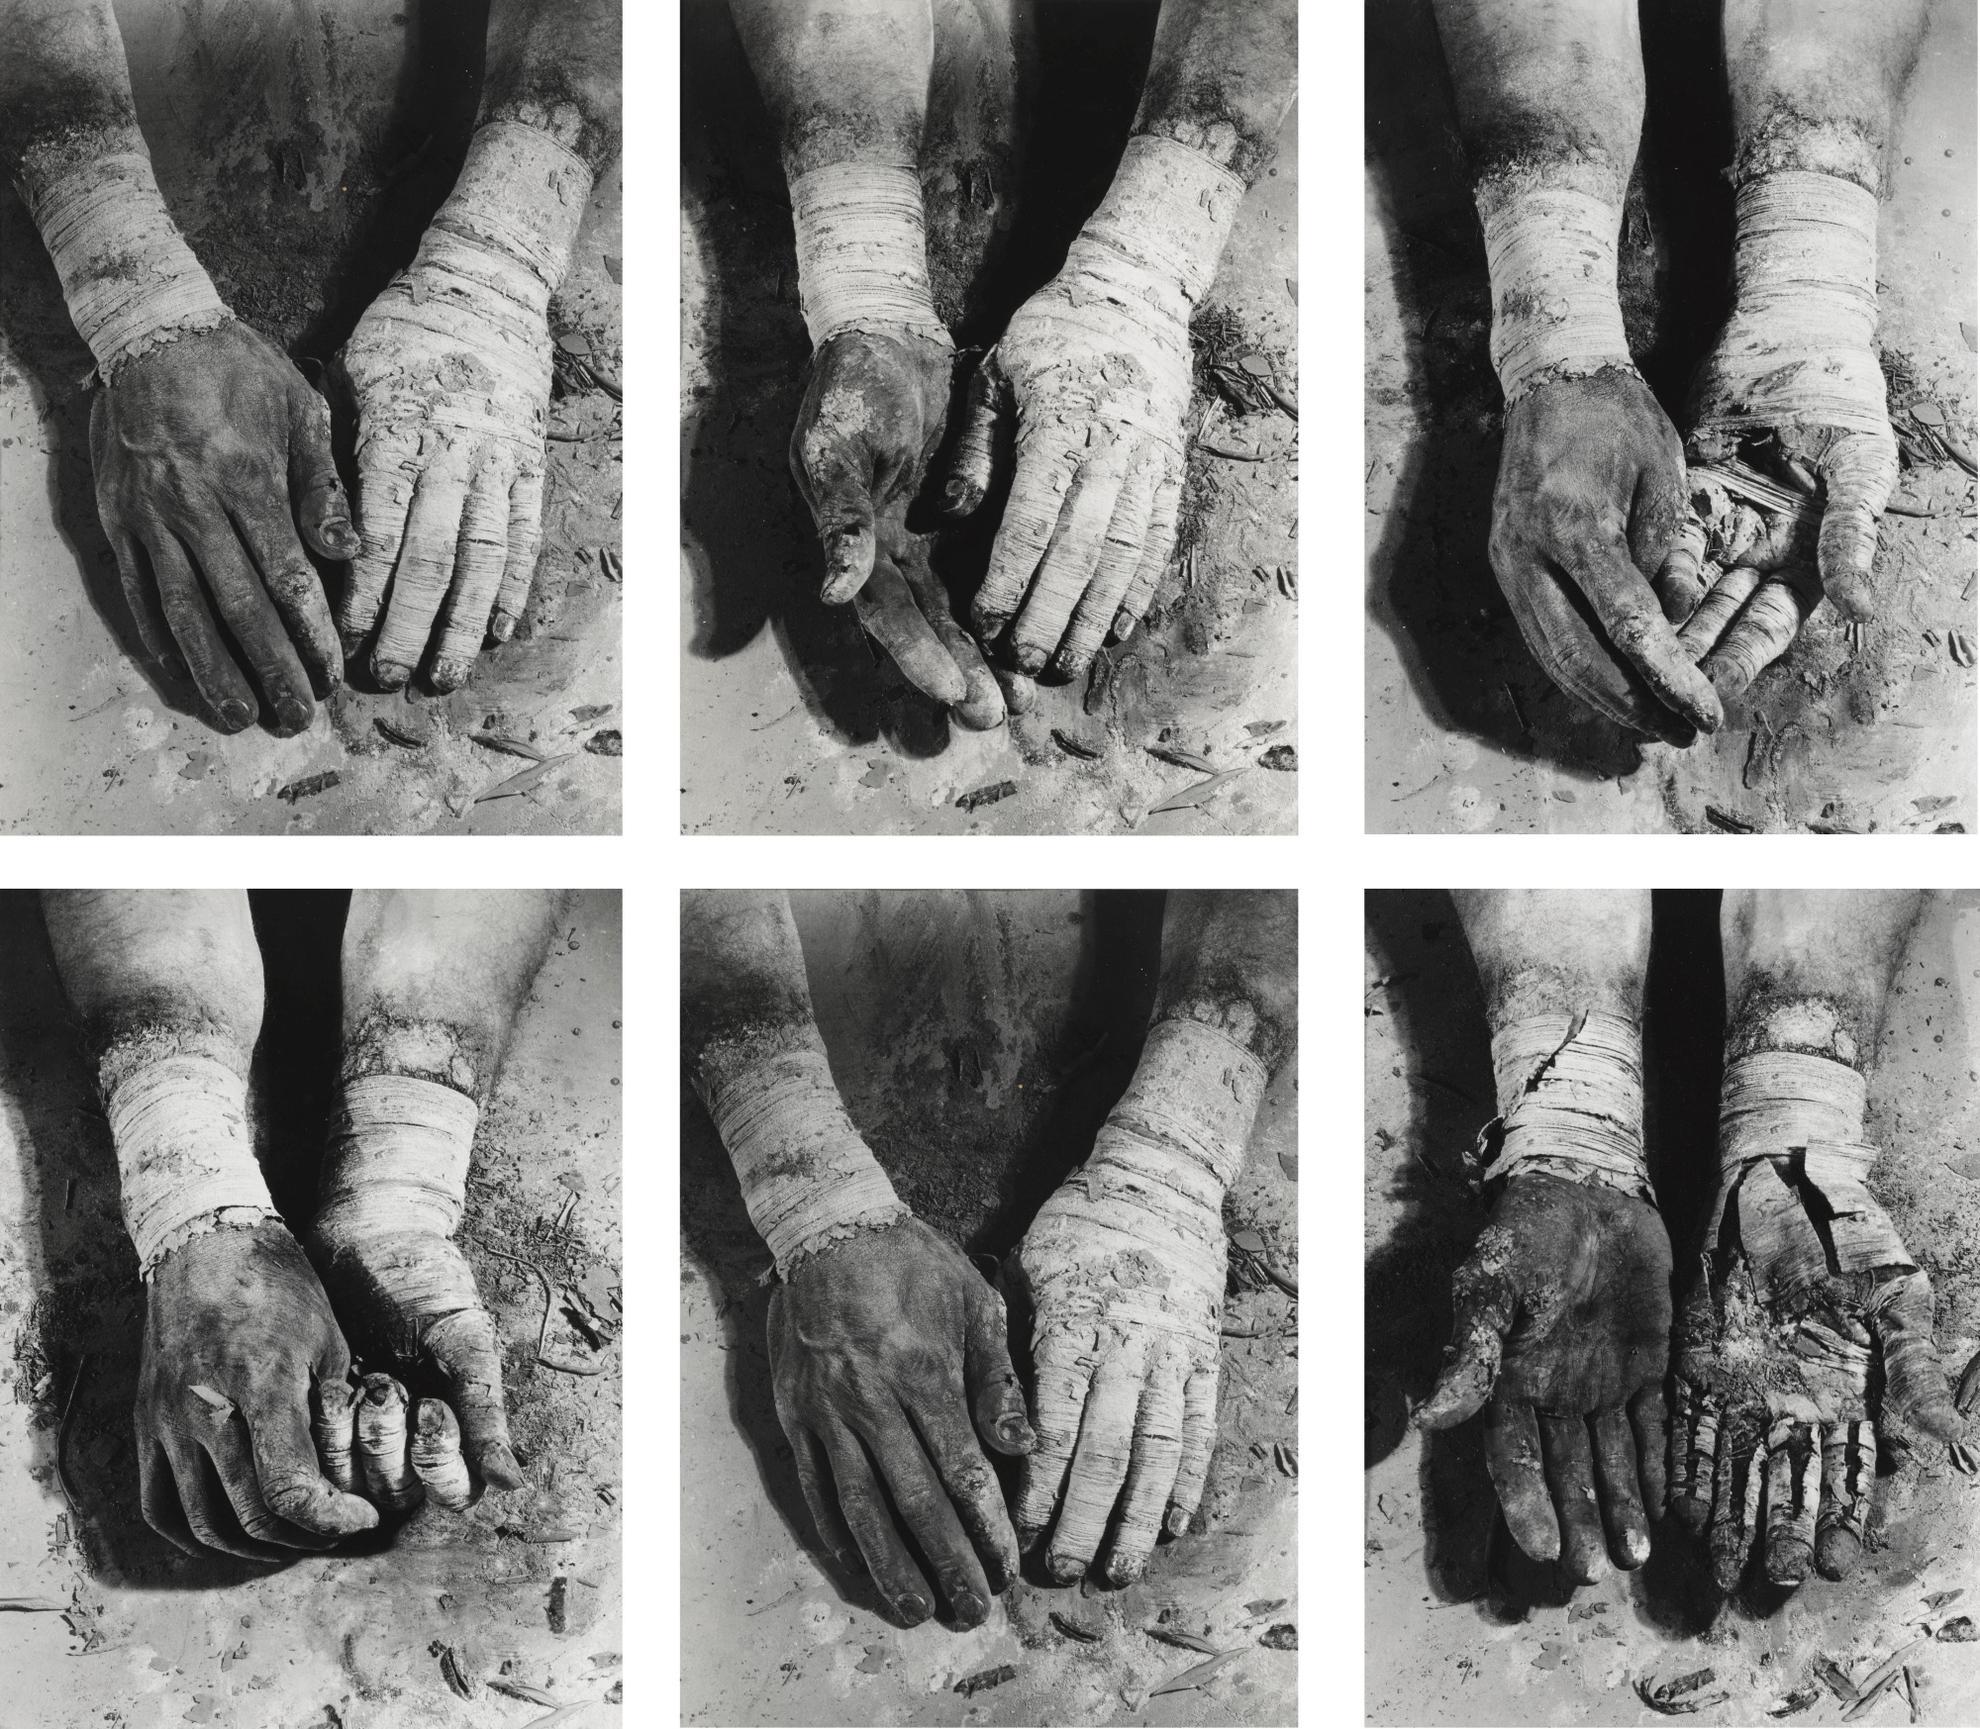 Dieter Appelt-Die Befreiung Der Finger (1-6)-1979